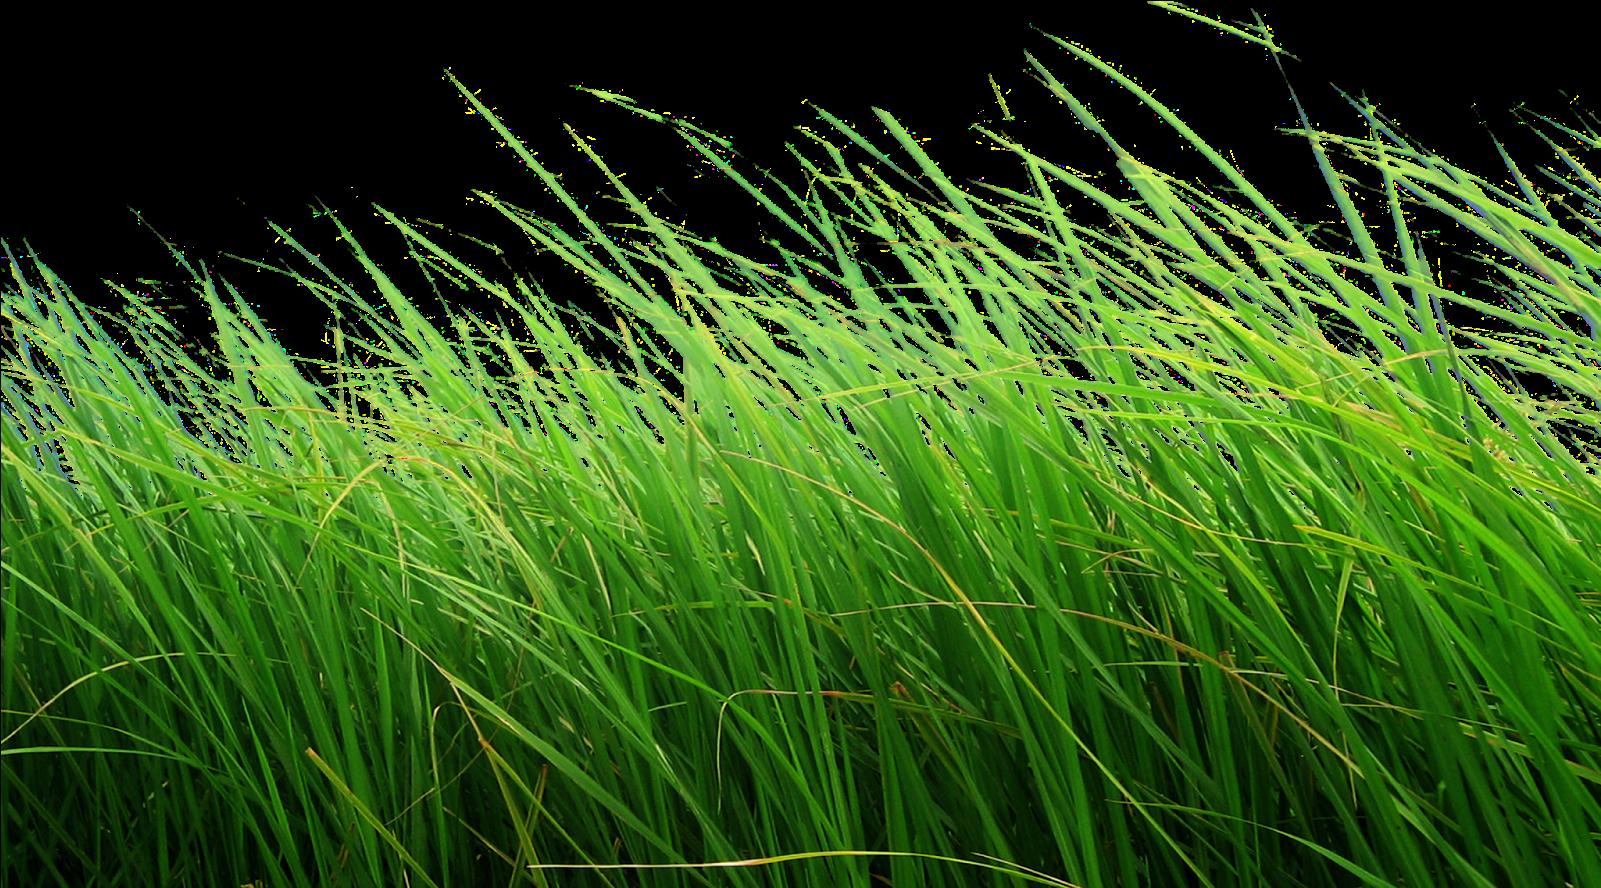 Download Cb Editing Flower Grass Png - Grass Png Transparent